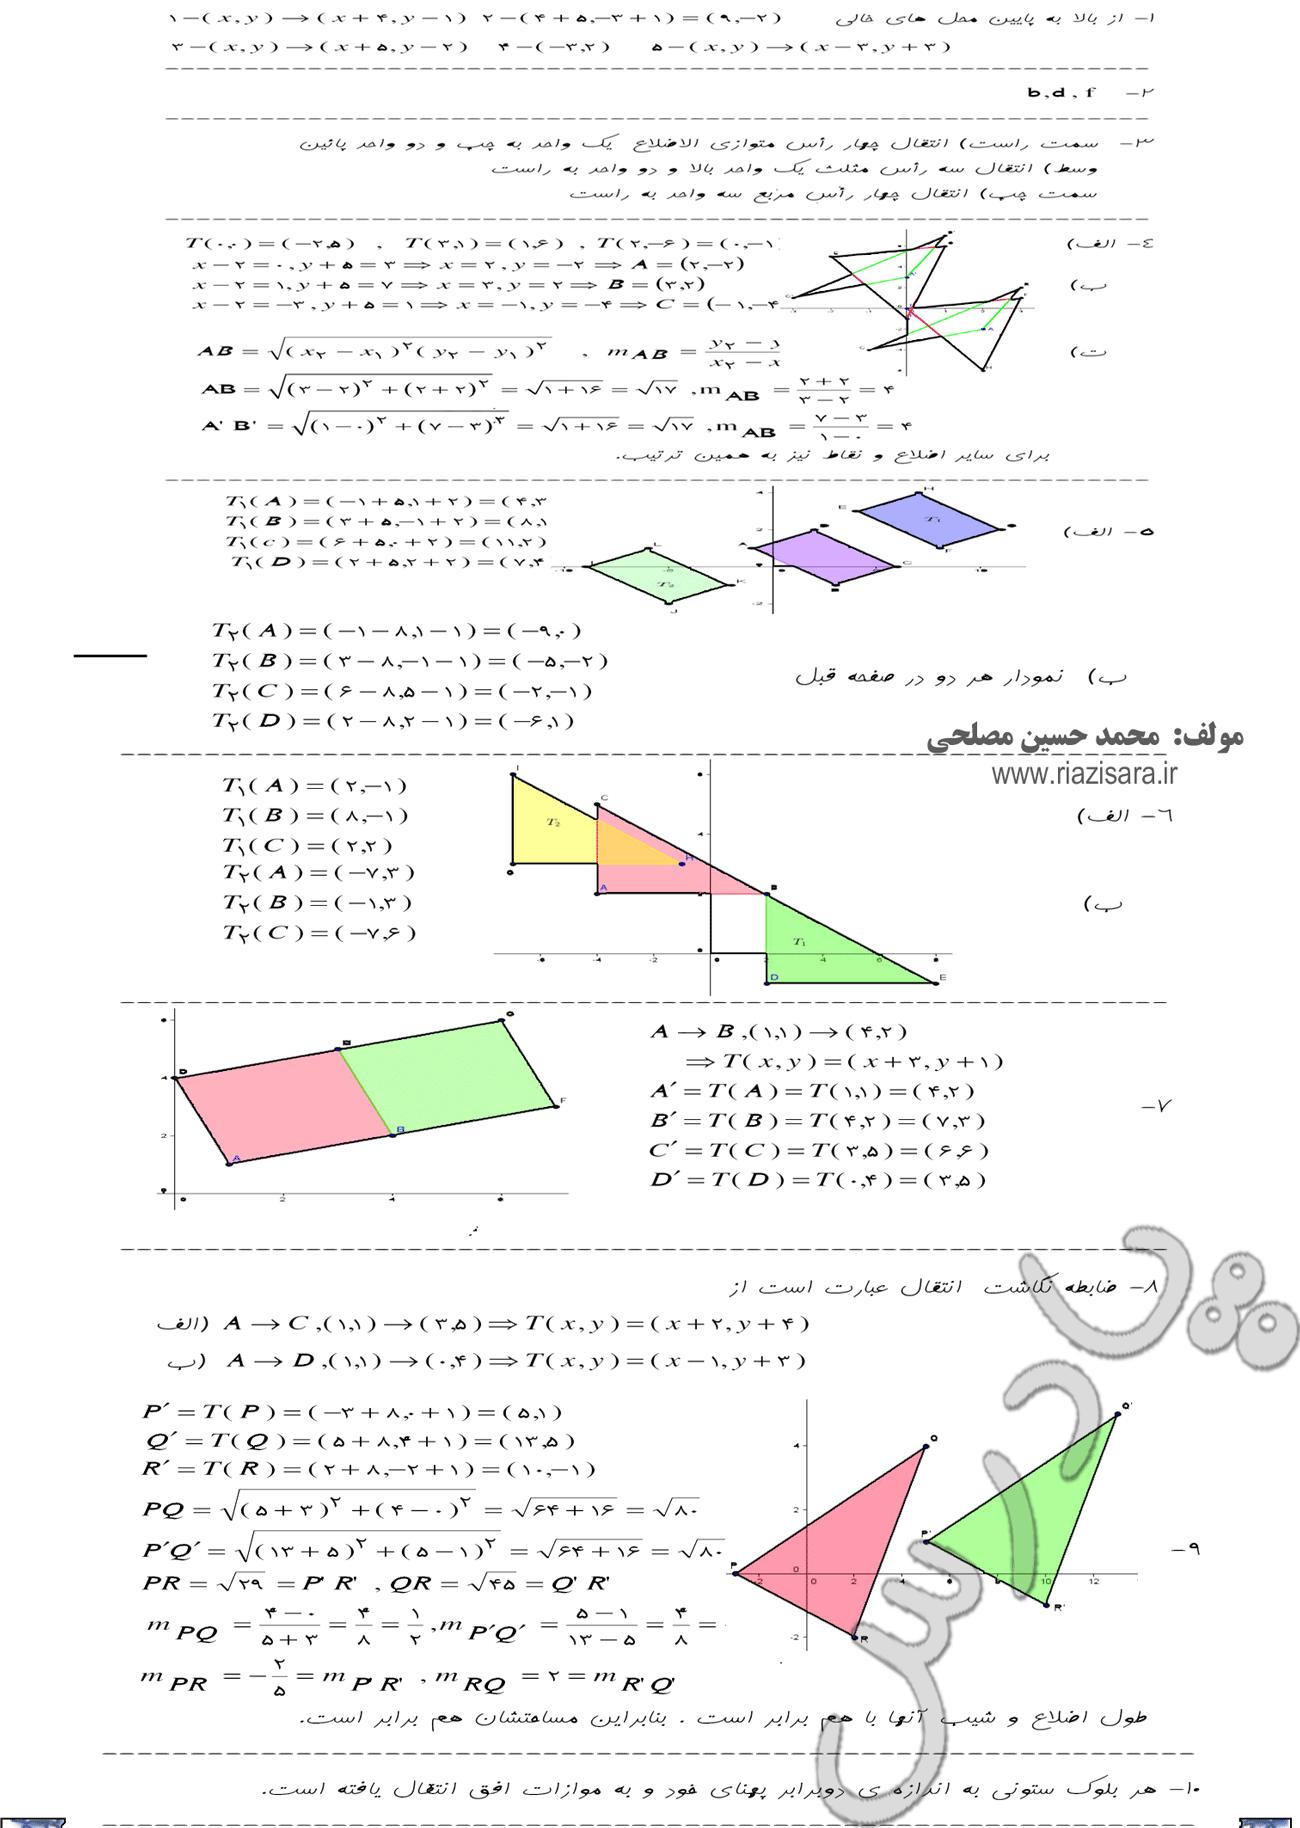 حل مسائل صفحه 95 فصل 3 هندسه 2